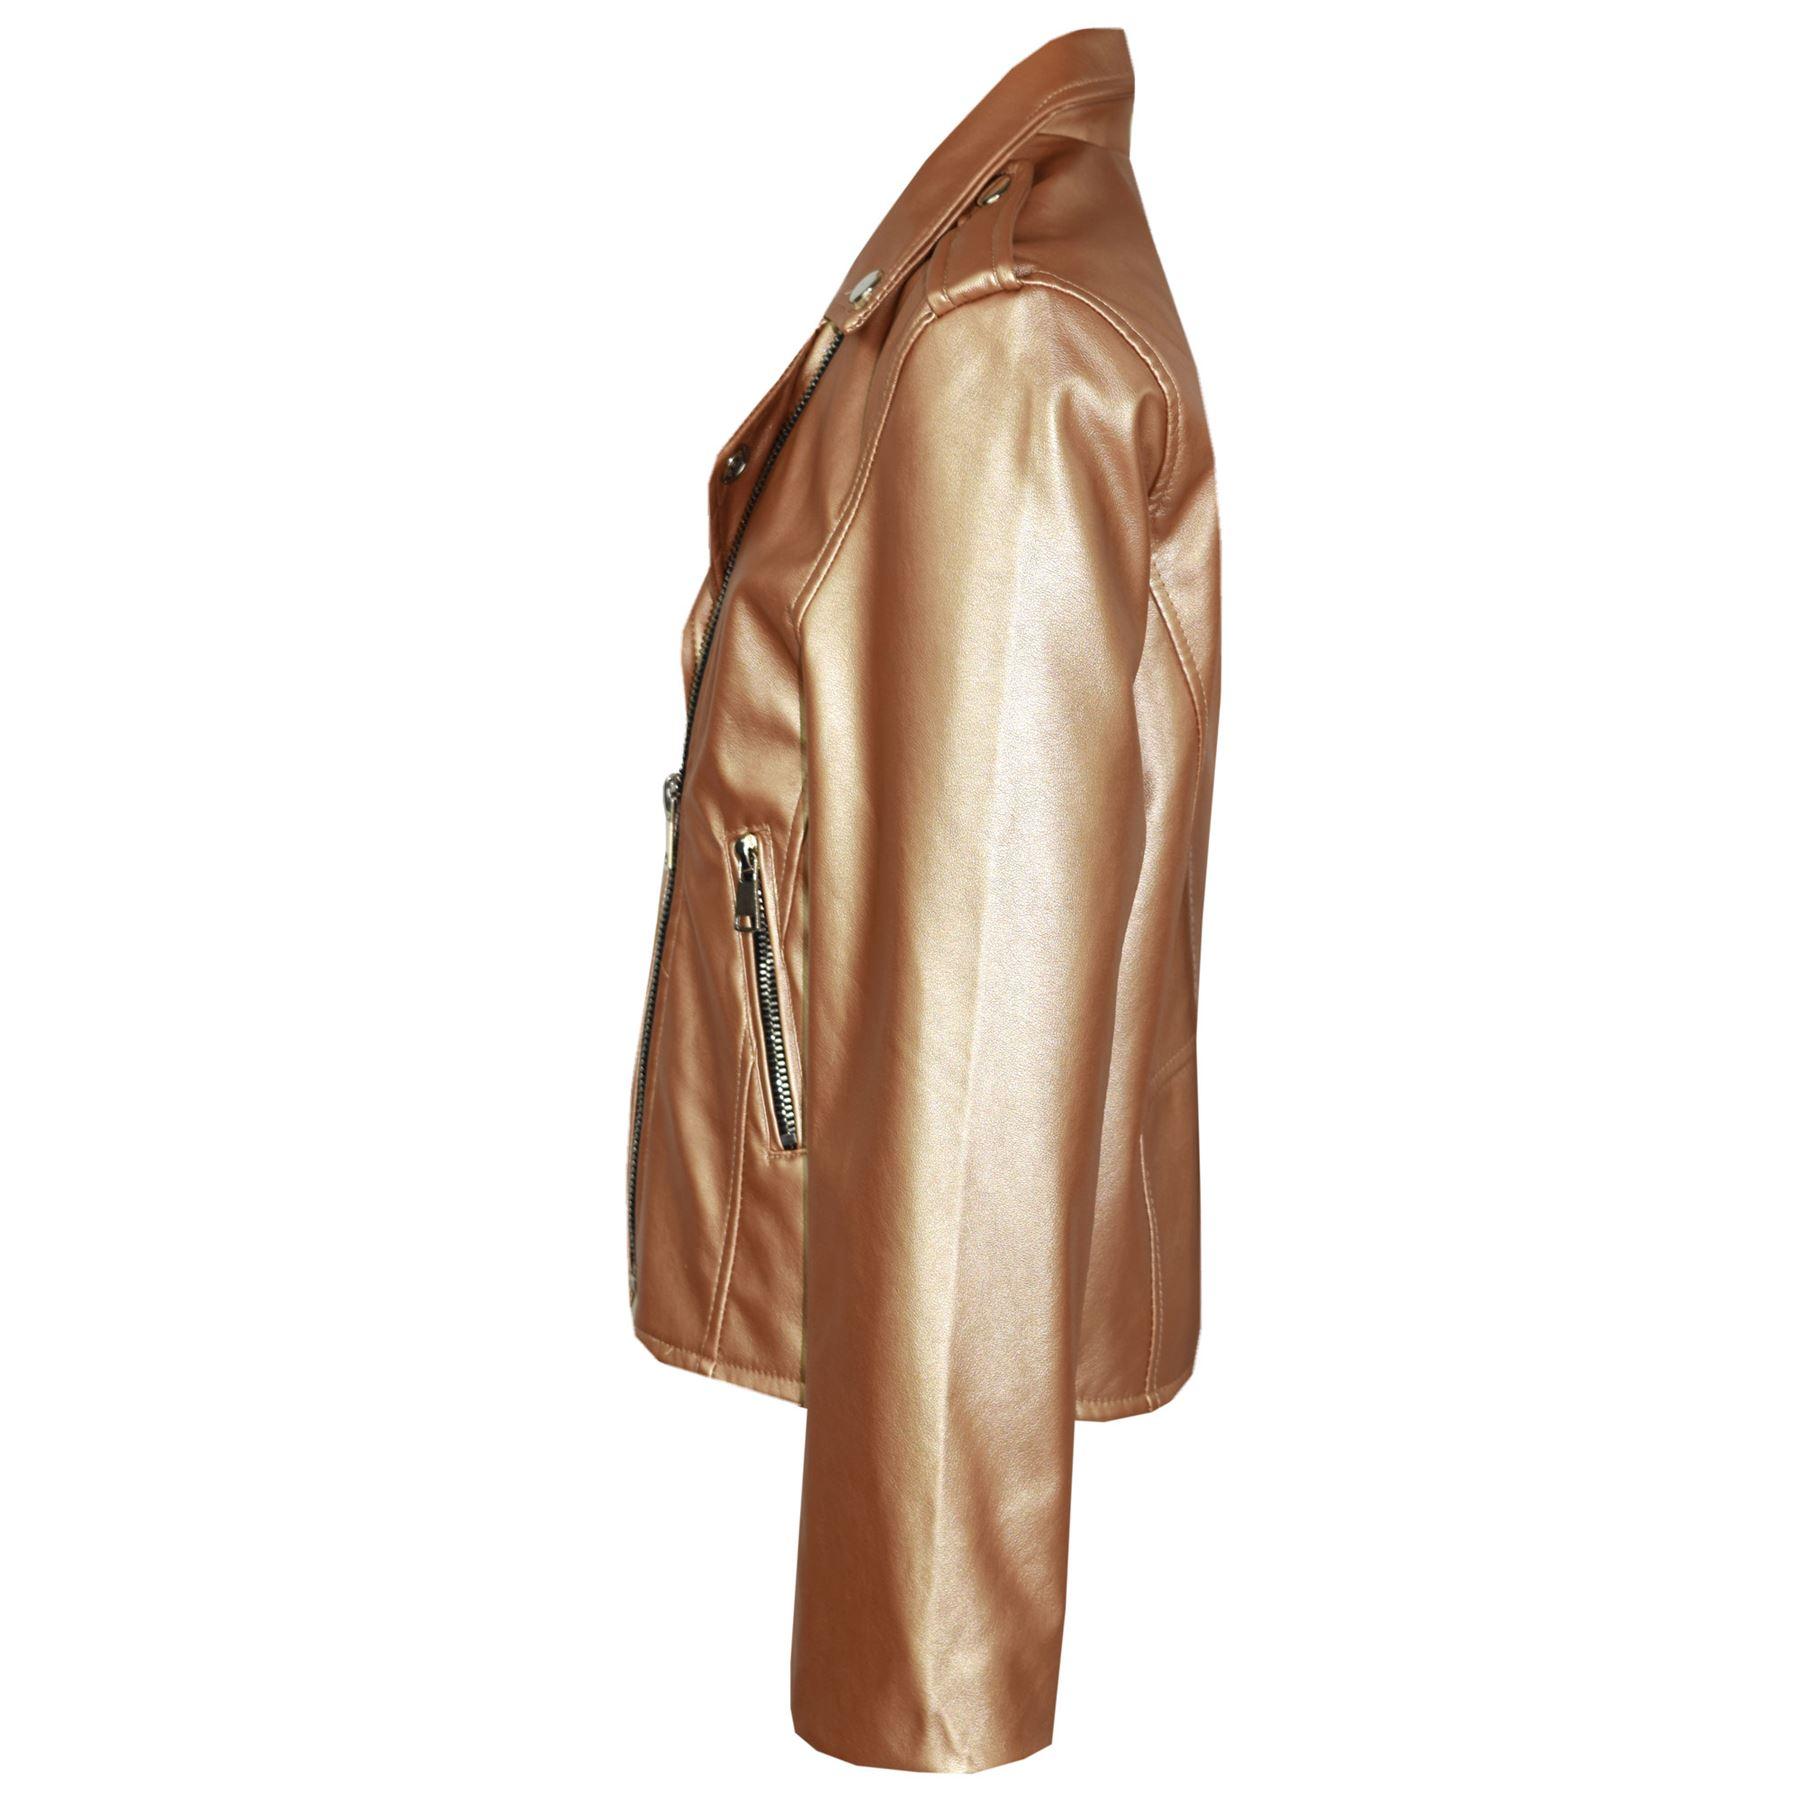 Kids Jacket Girls Designer/'s PU Leather Jackets Zip Up Biker Coats 7-13 Year